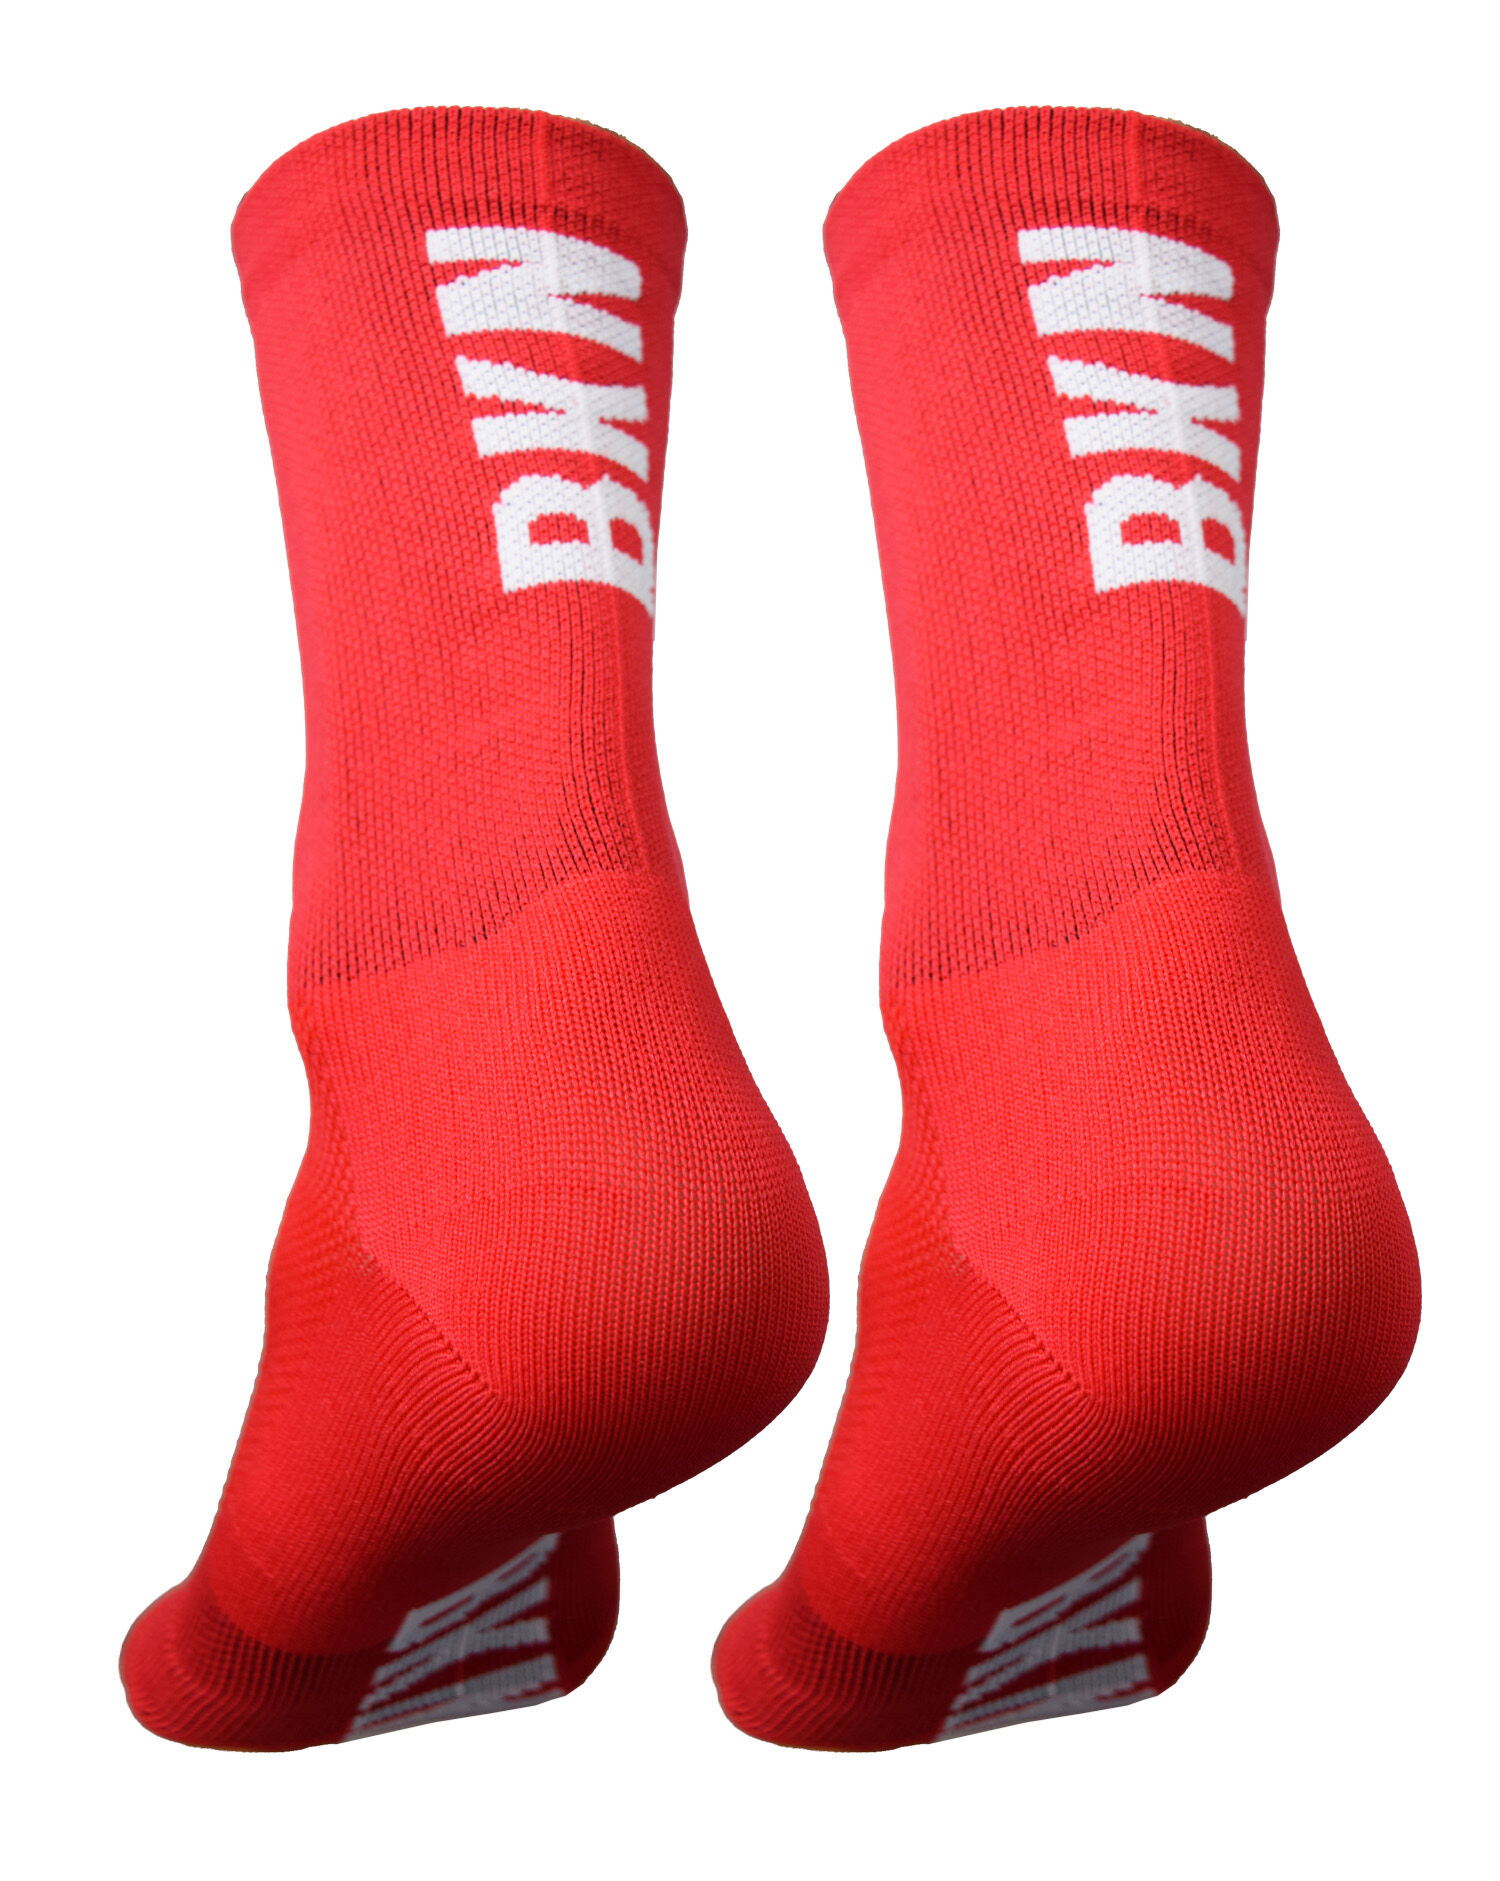 BKN Solid RED Socks